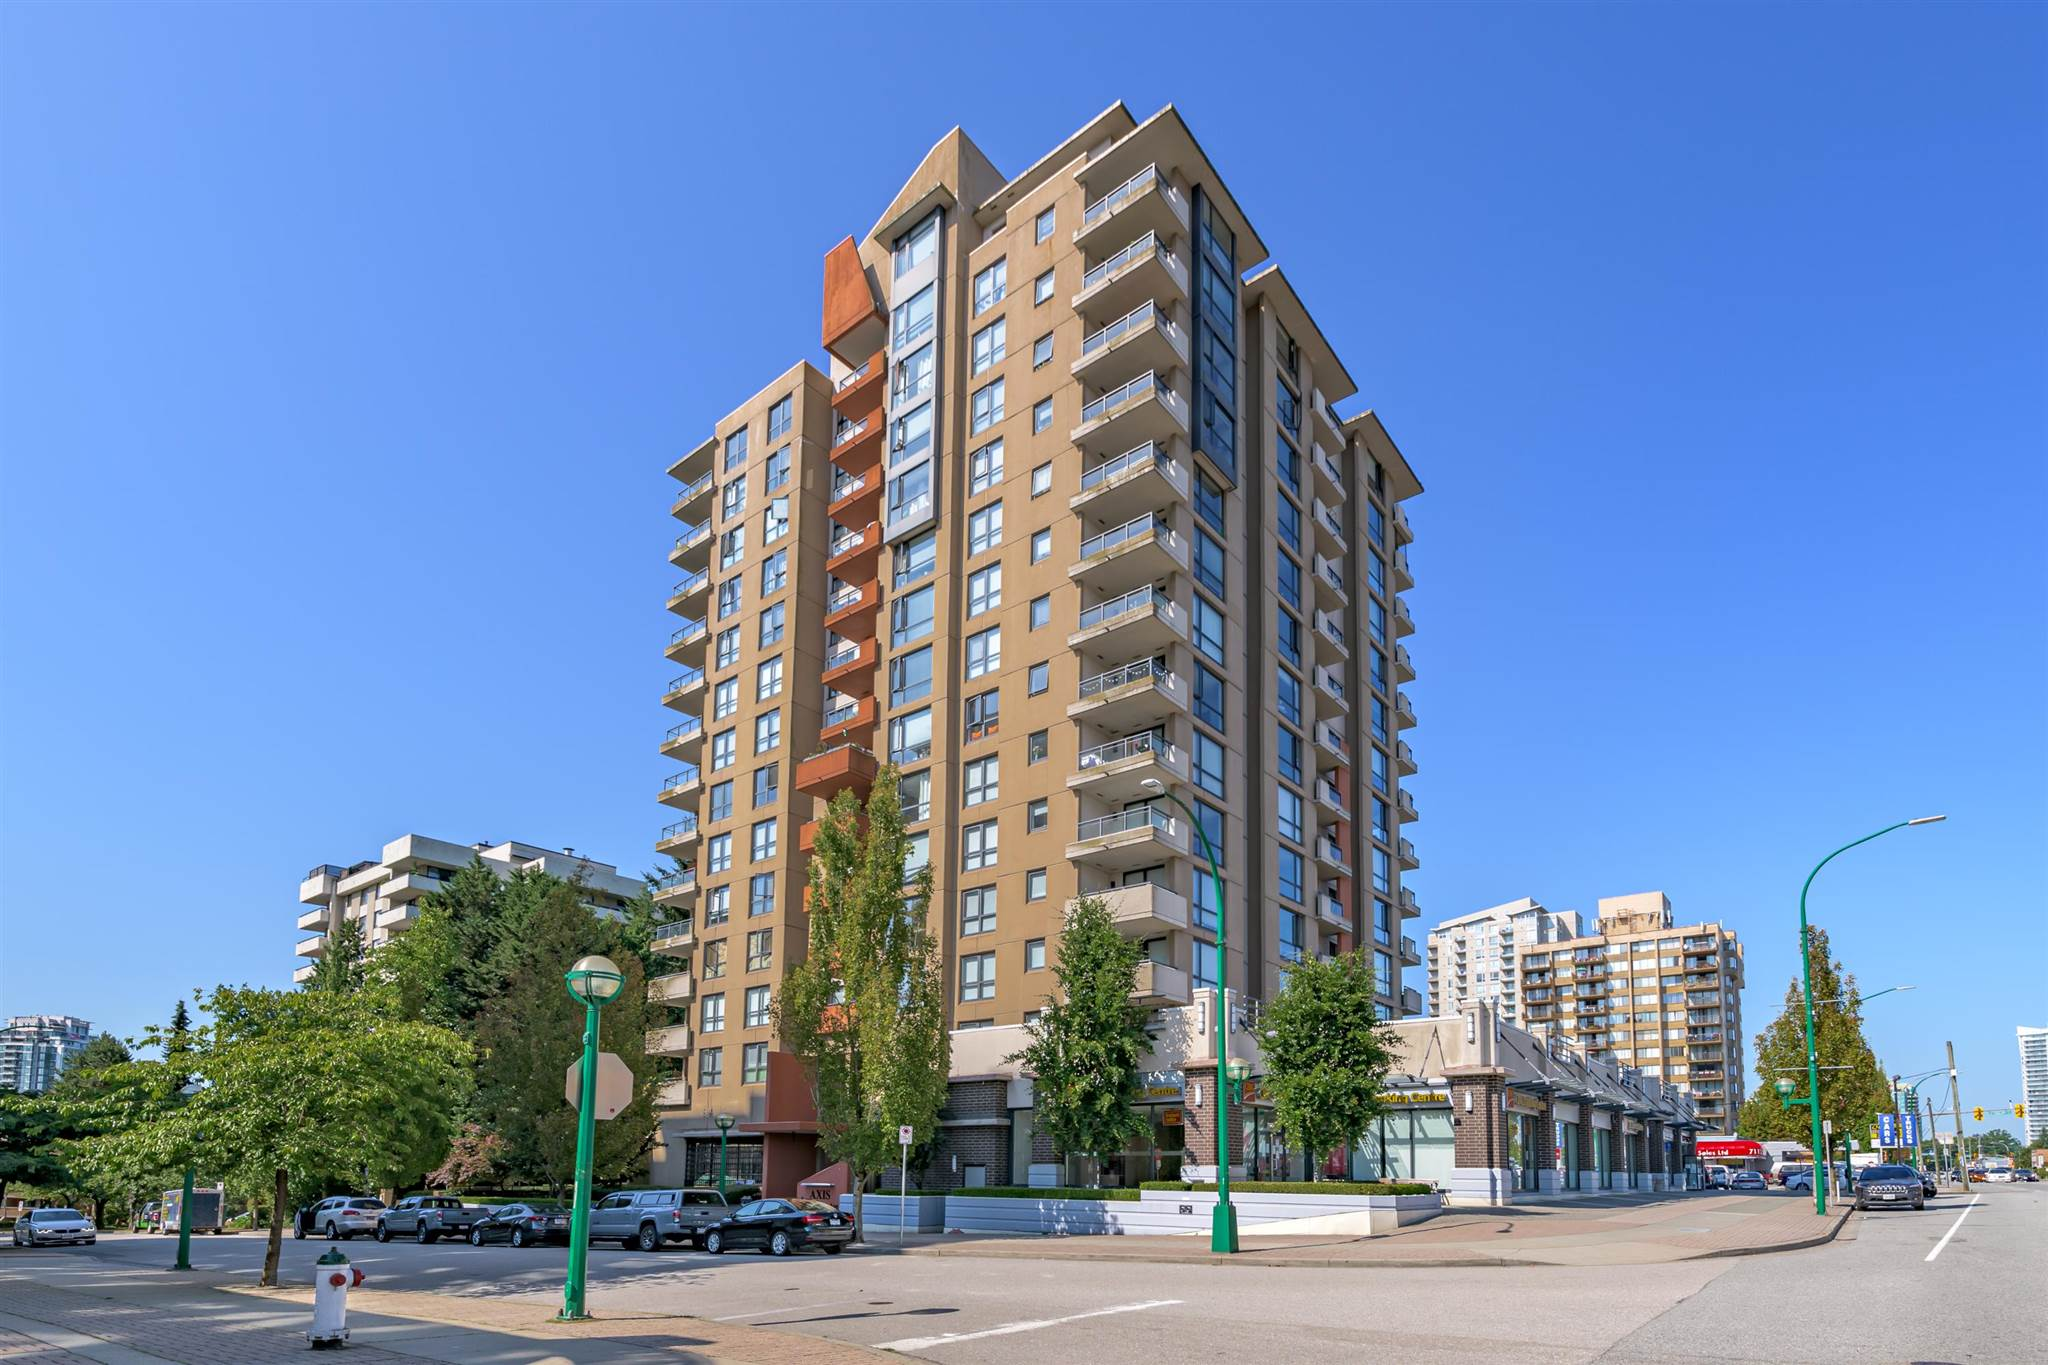 205 7225 ACORN AVENUE - Highgate Apartment/Condo for sale, 2 Bedrooms (R2606454) - #23